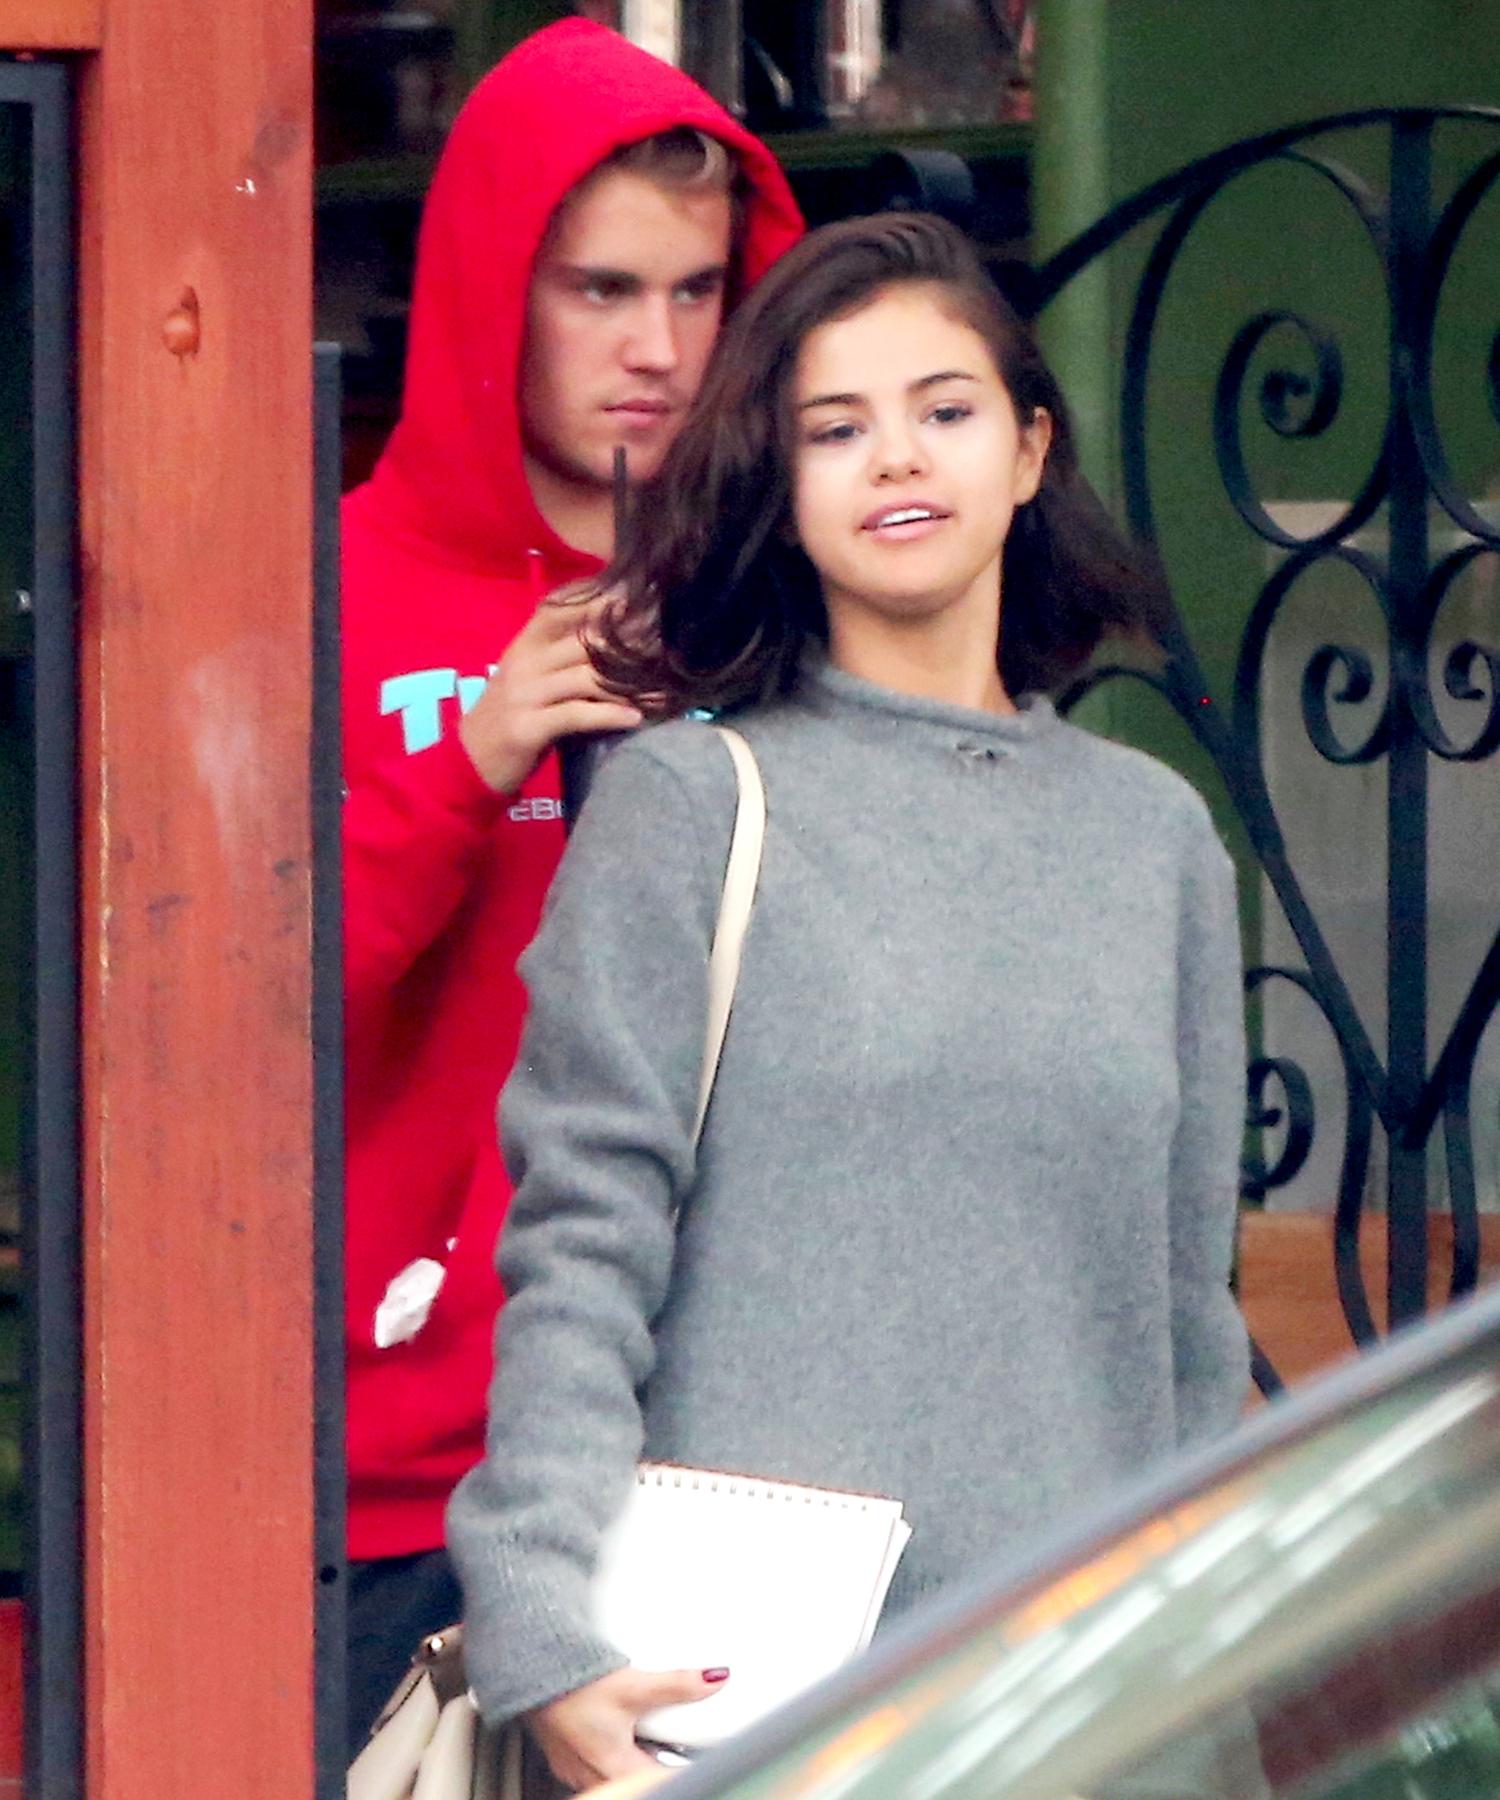 Justin Bieber And Selena Gomez Snuggle Bike Ride Through Los